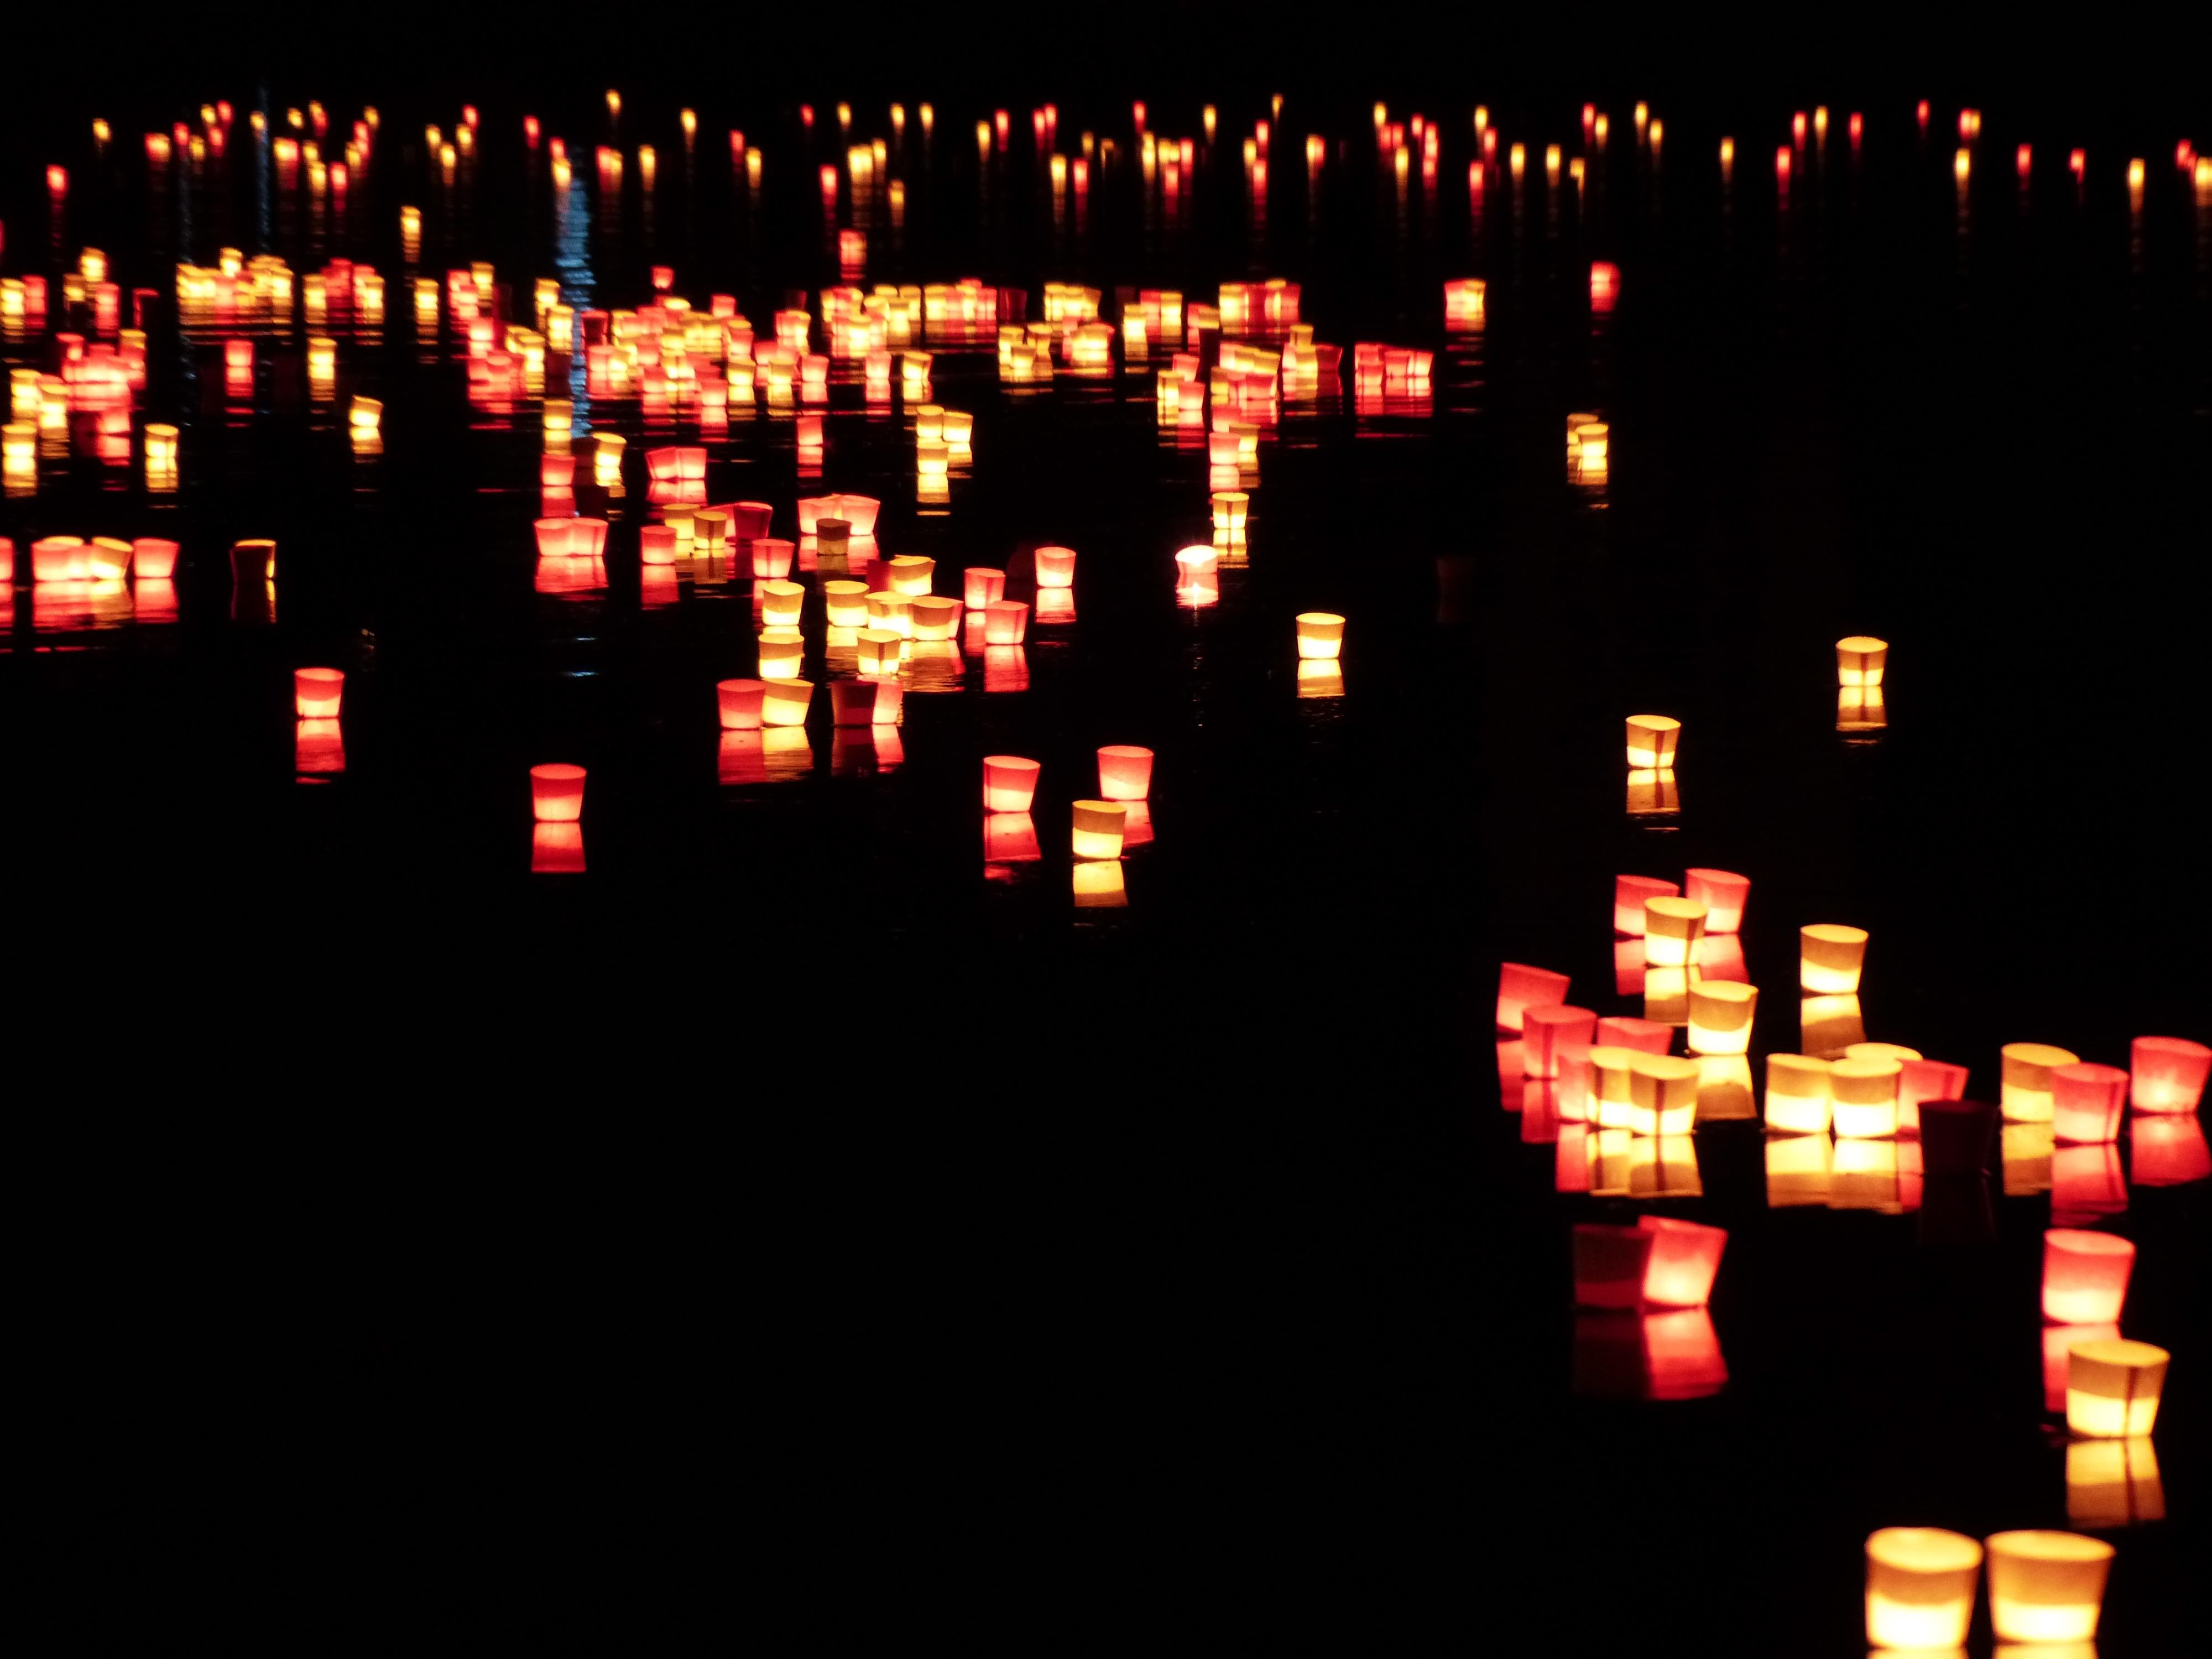 heat long exposure christmas decoration font mood candlelight screenshot ulm festival of lights christmas lights thousands floating candles - Candle Christmas Lights